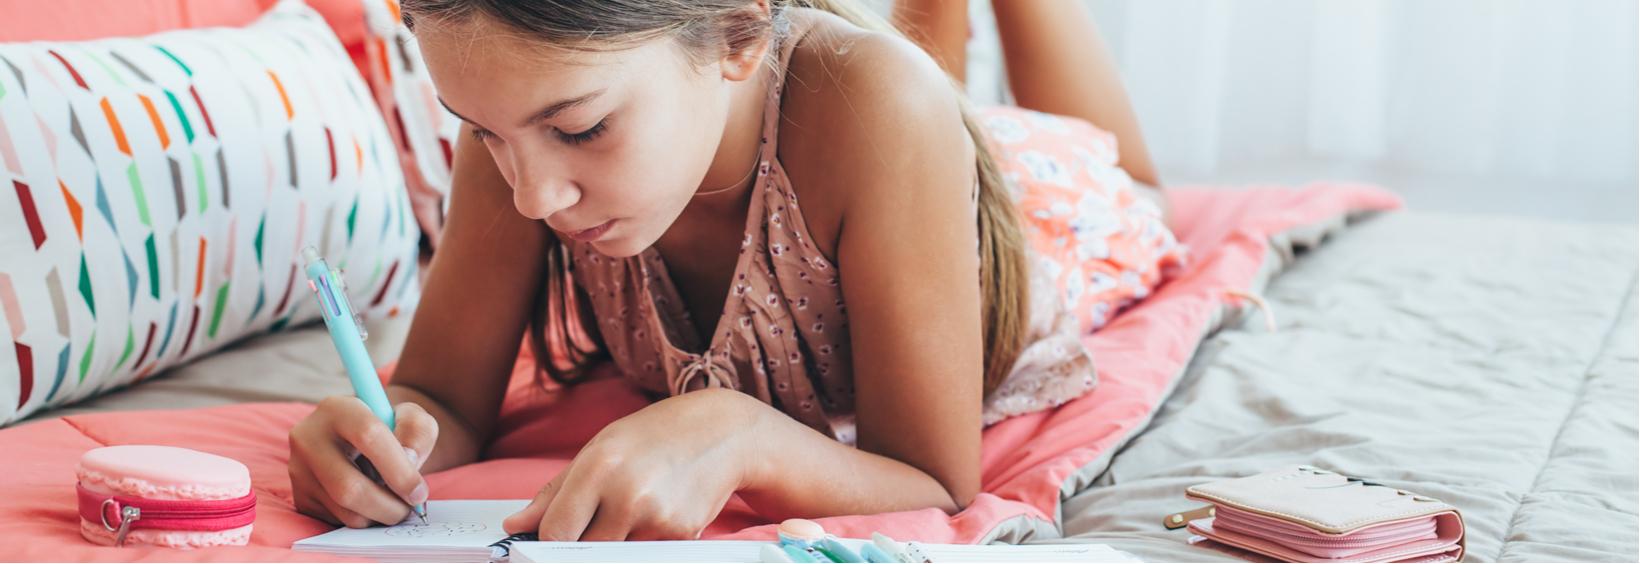 8 Fun, Mind-Stimulating Activities for Kids